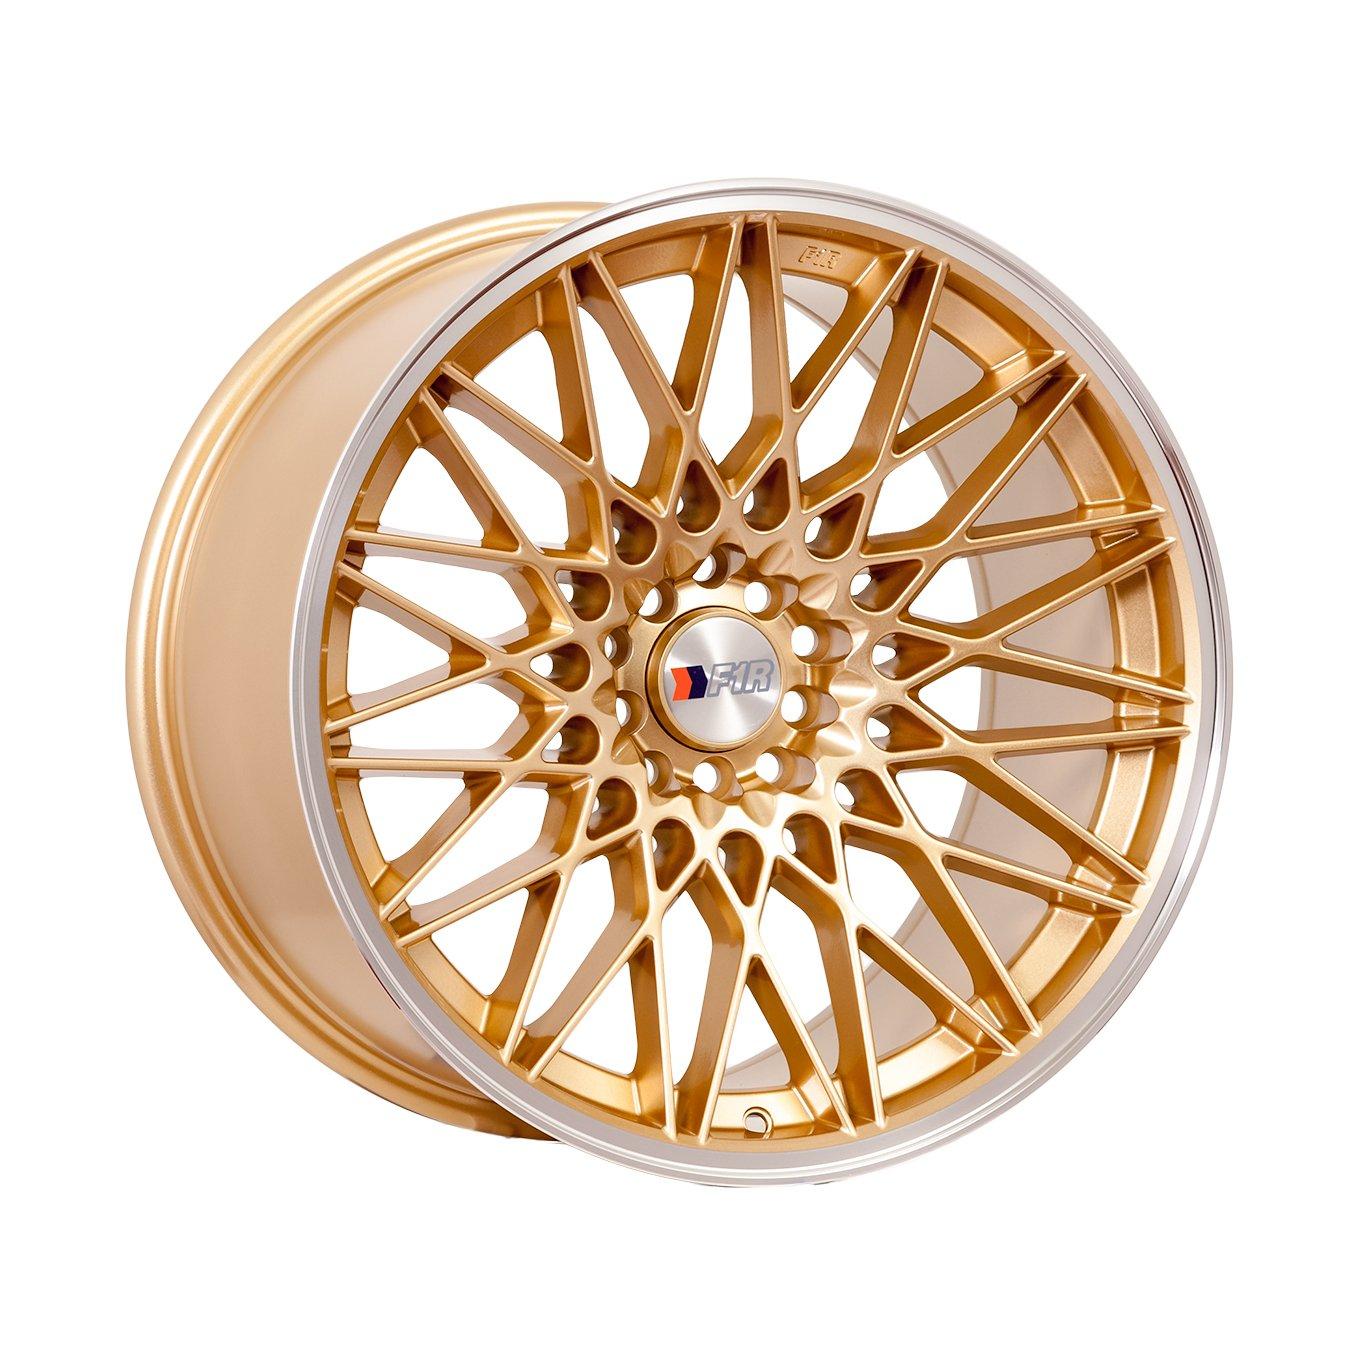 18x8.5 F1R F23 Gold w/ Polish Lip Rim Offset(38) Lug(5x100/5x114.3) Bore(73.1) 1 Wheel -- F231885G38